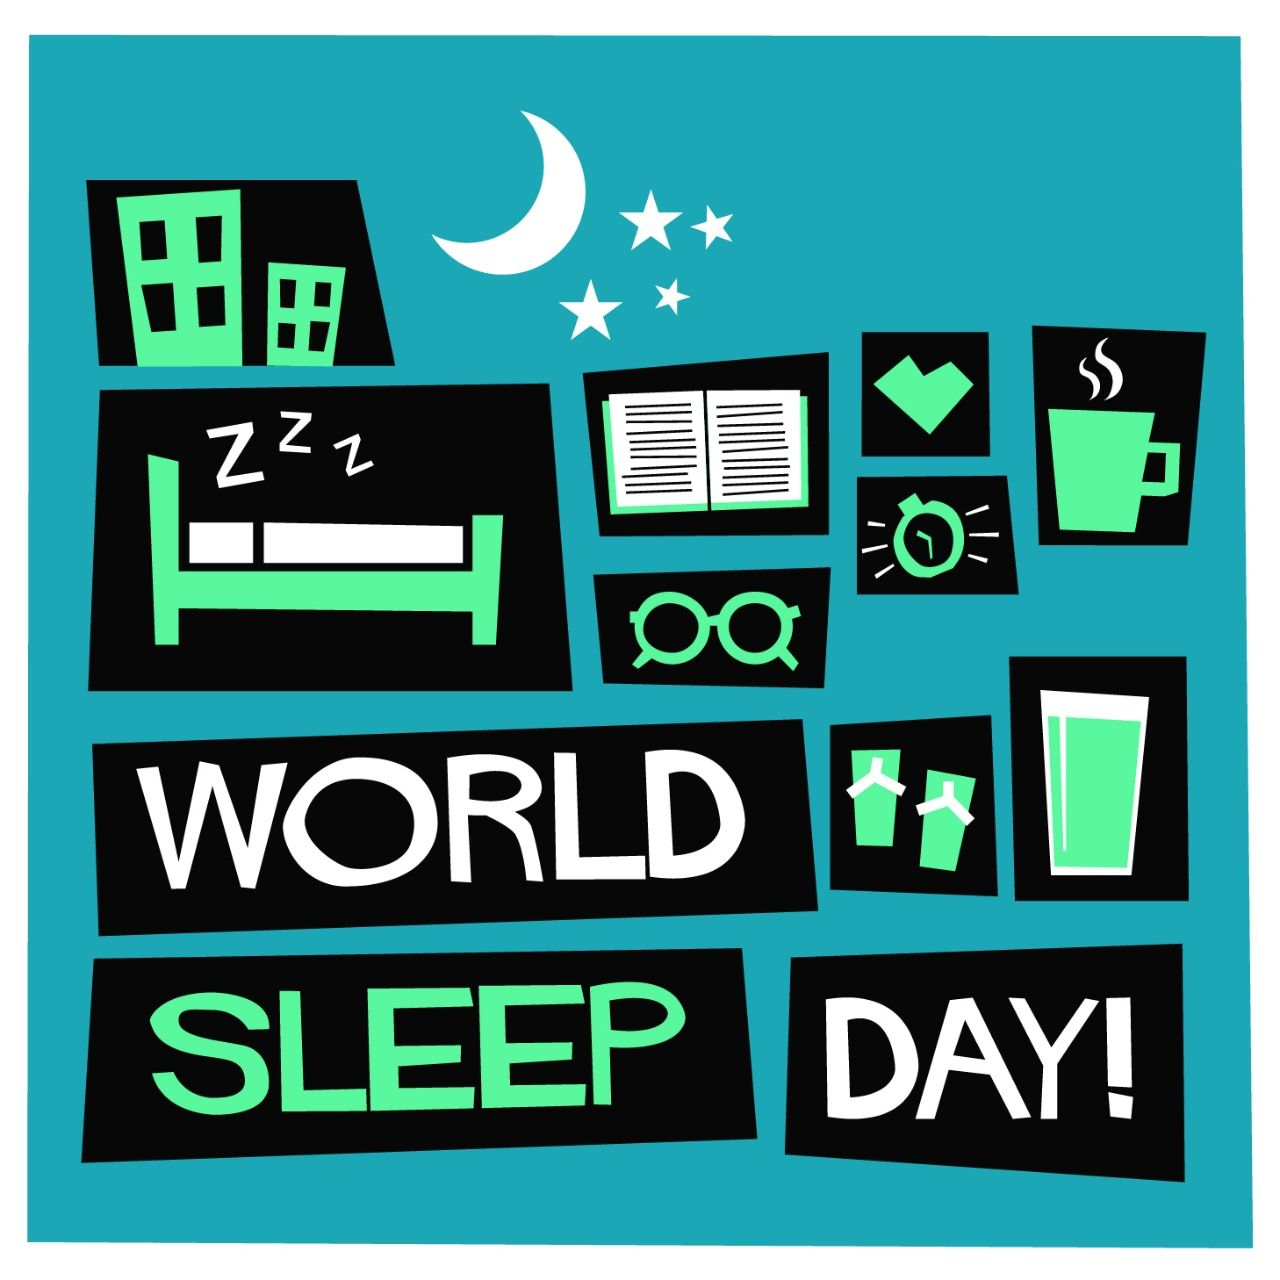 world sleep day theme world sleep day themes 2020 world sleep day funny themes happy world sleep day